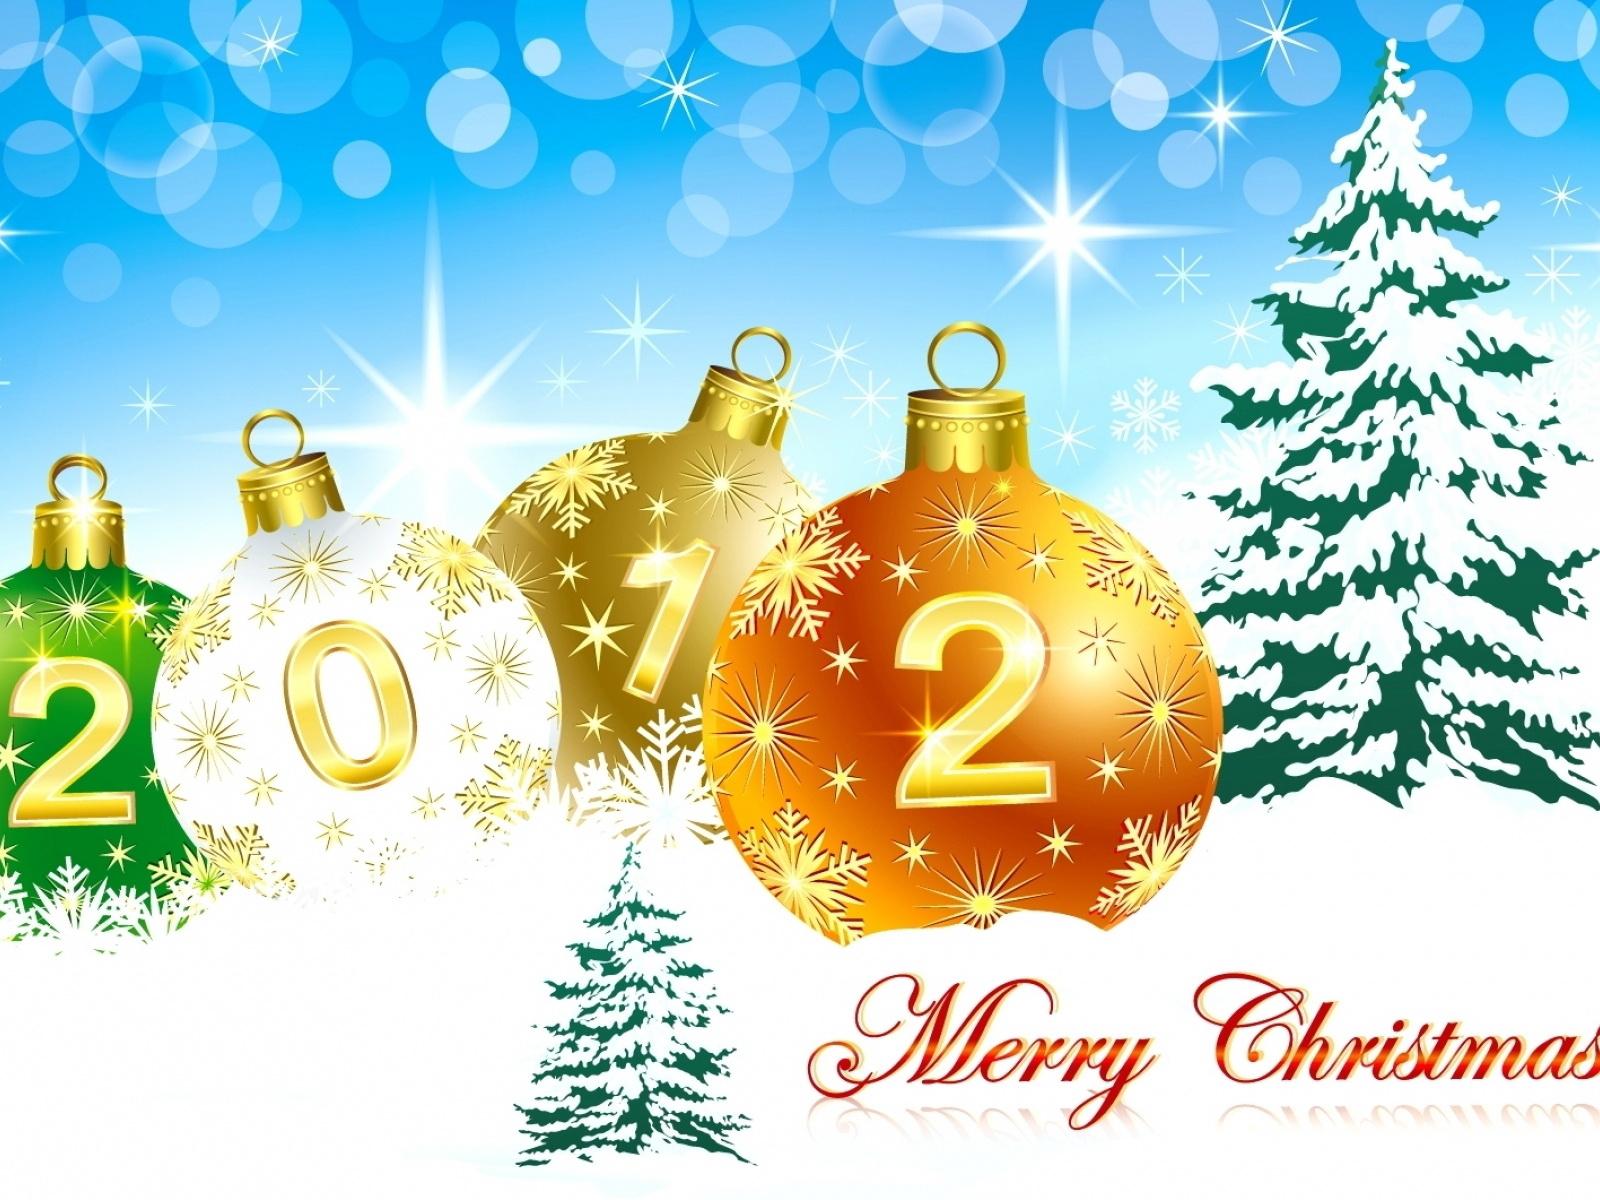 sparkling christmas 2012 wallpaper - Christmas 2012